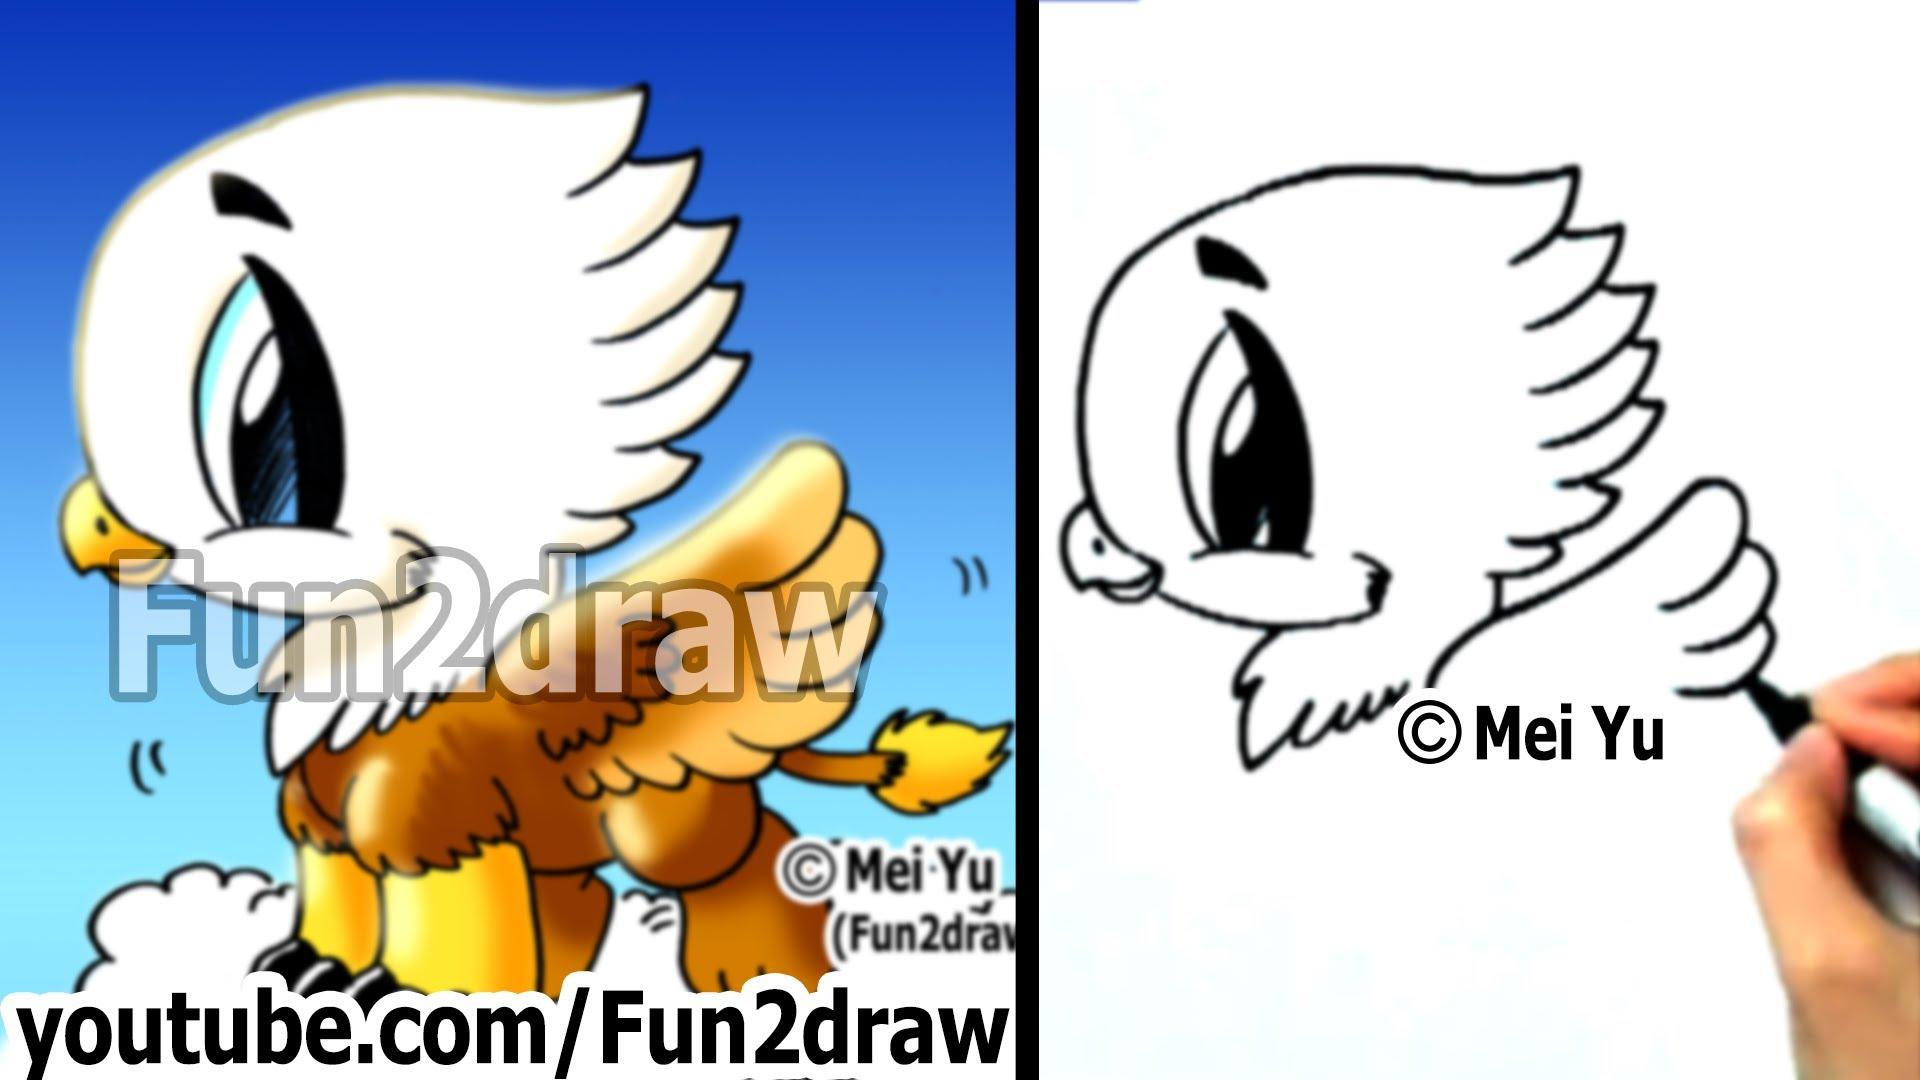 Drawn phoenix Drawn Griffin Fun2draw in Draw a